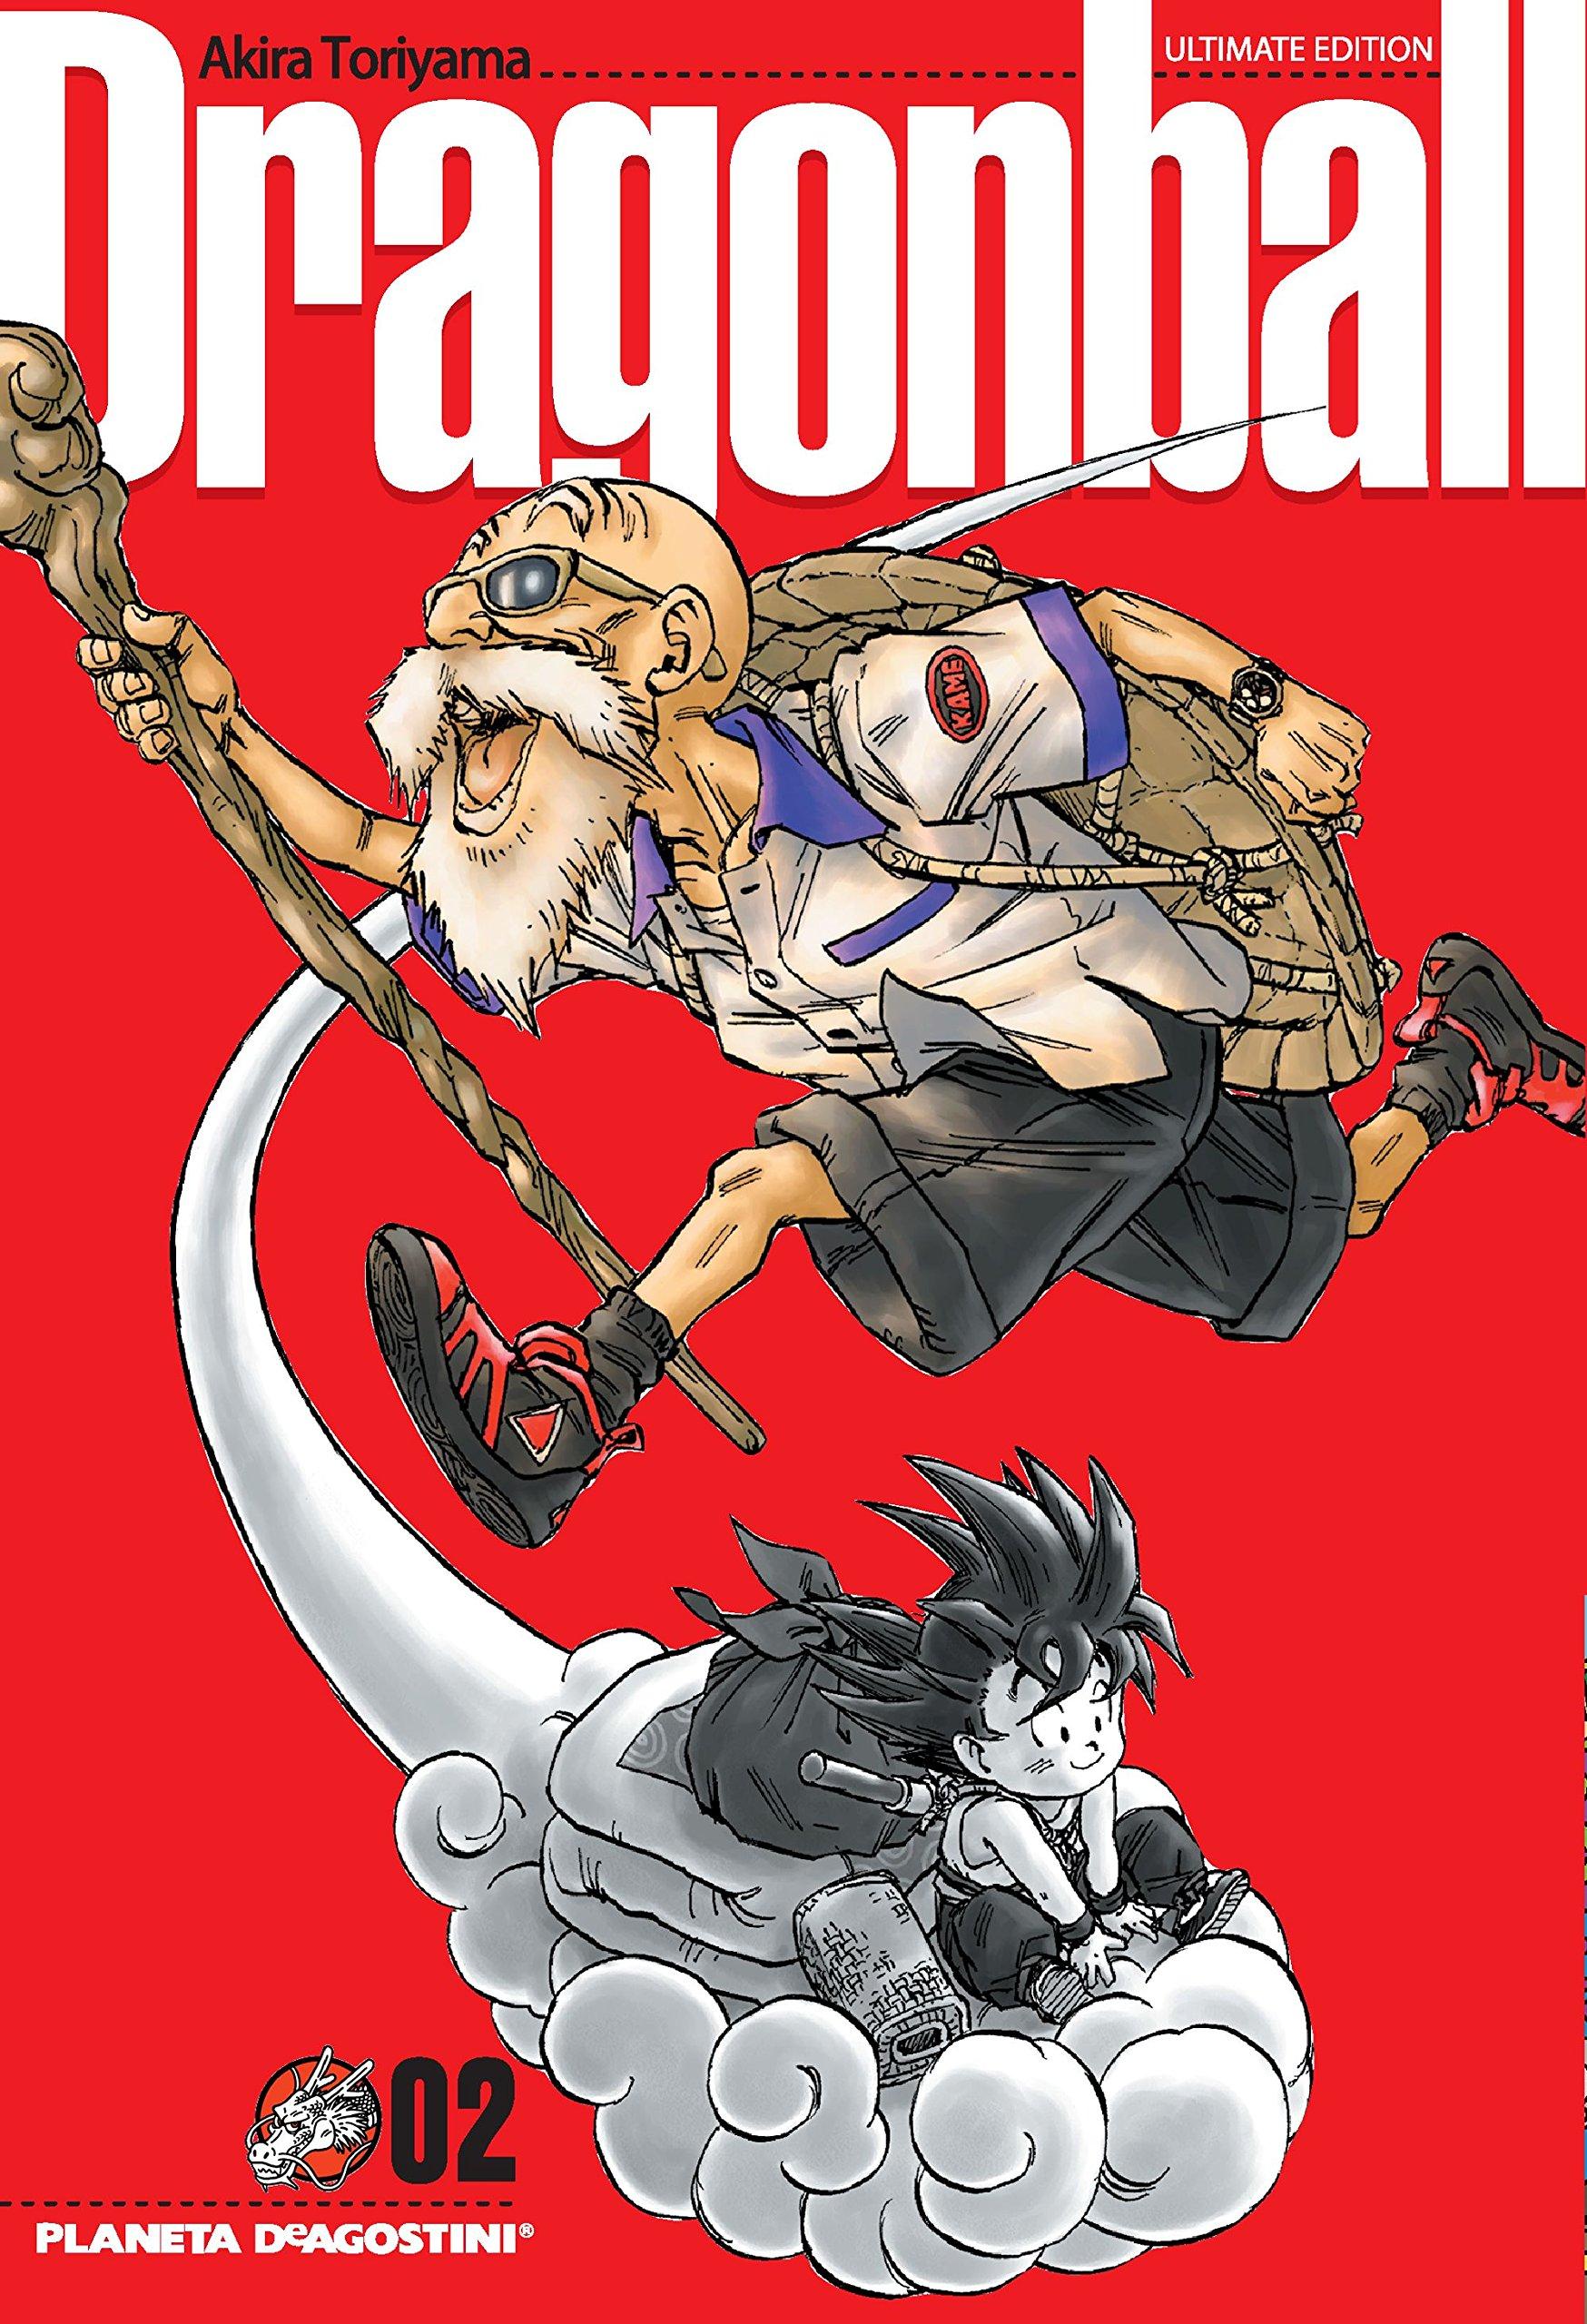 Dragon Ball nº 02/34 (DRAGON BALL ULTIMATE) Tapa blanda – 18 sep 2007 Akira Toriyama Planeta DeAgostini Cómics 846847035X Cómics y novelas gráficas